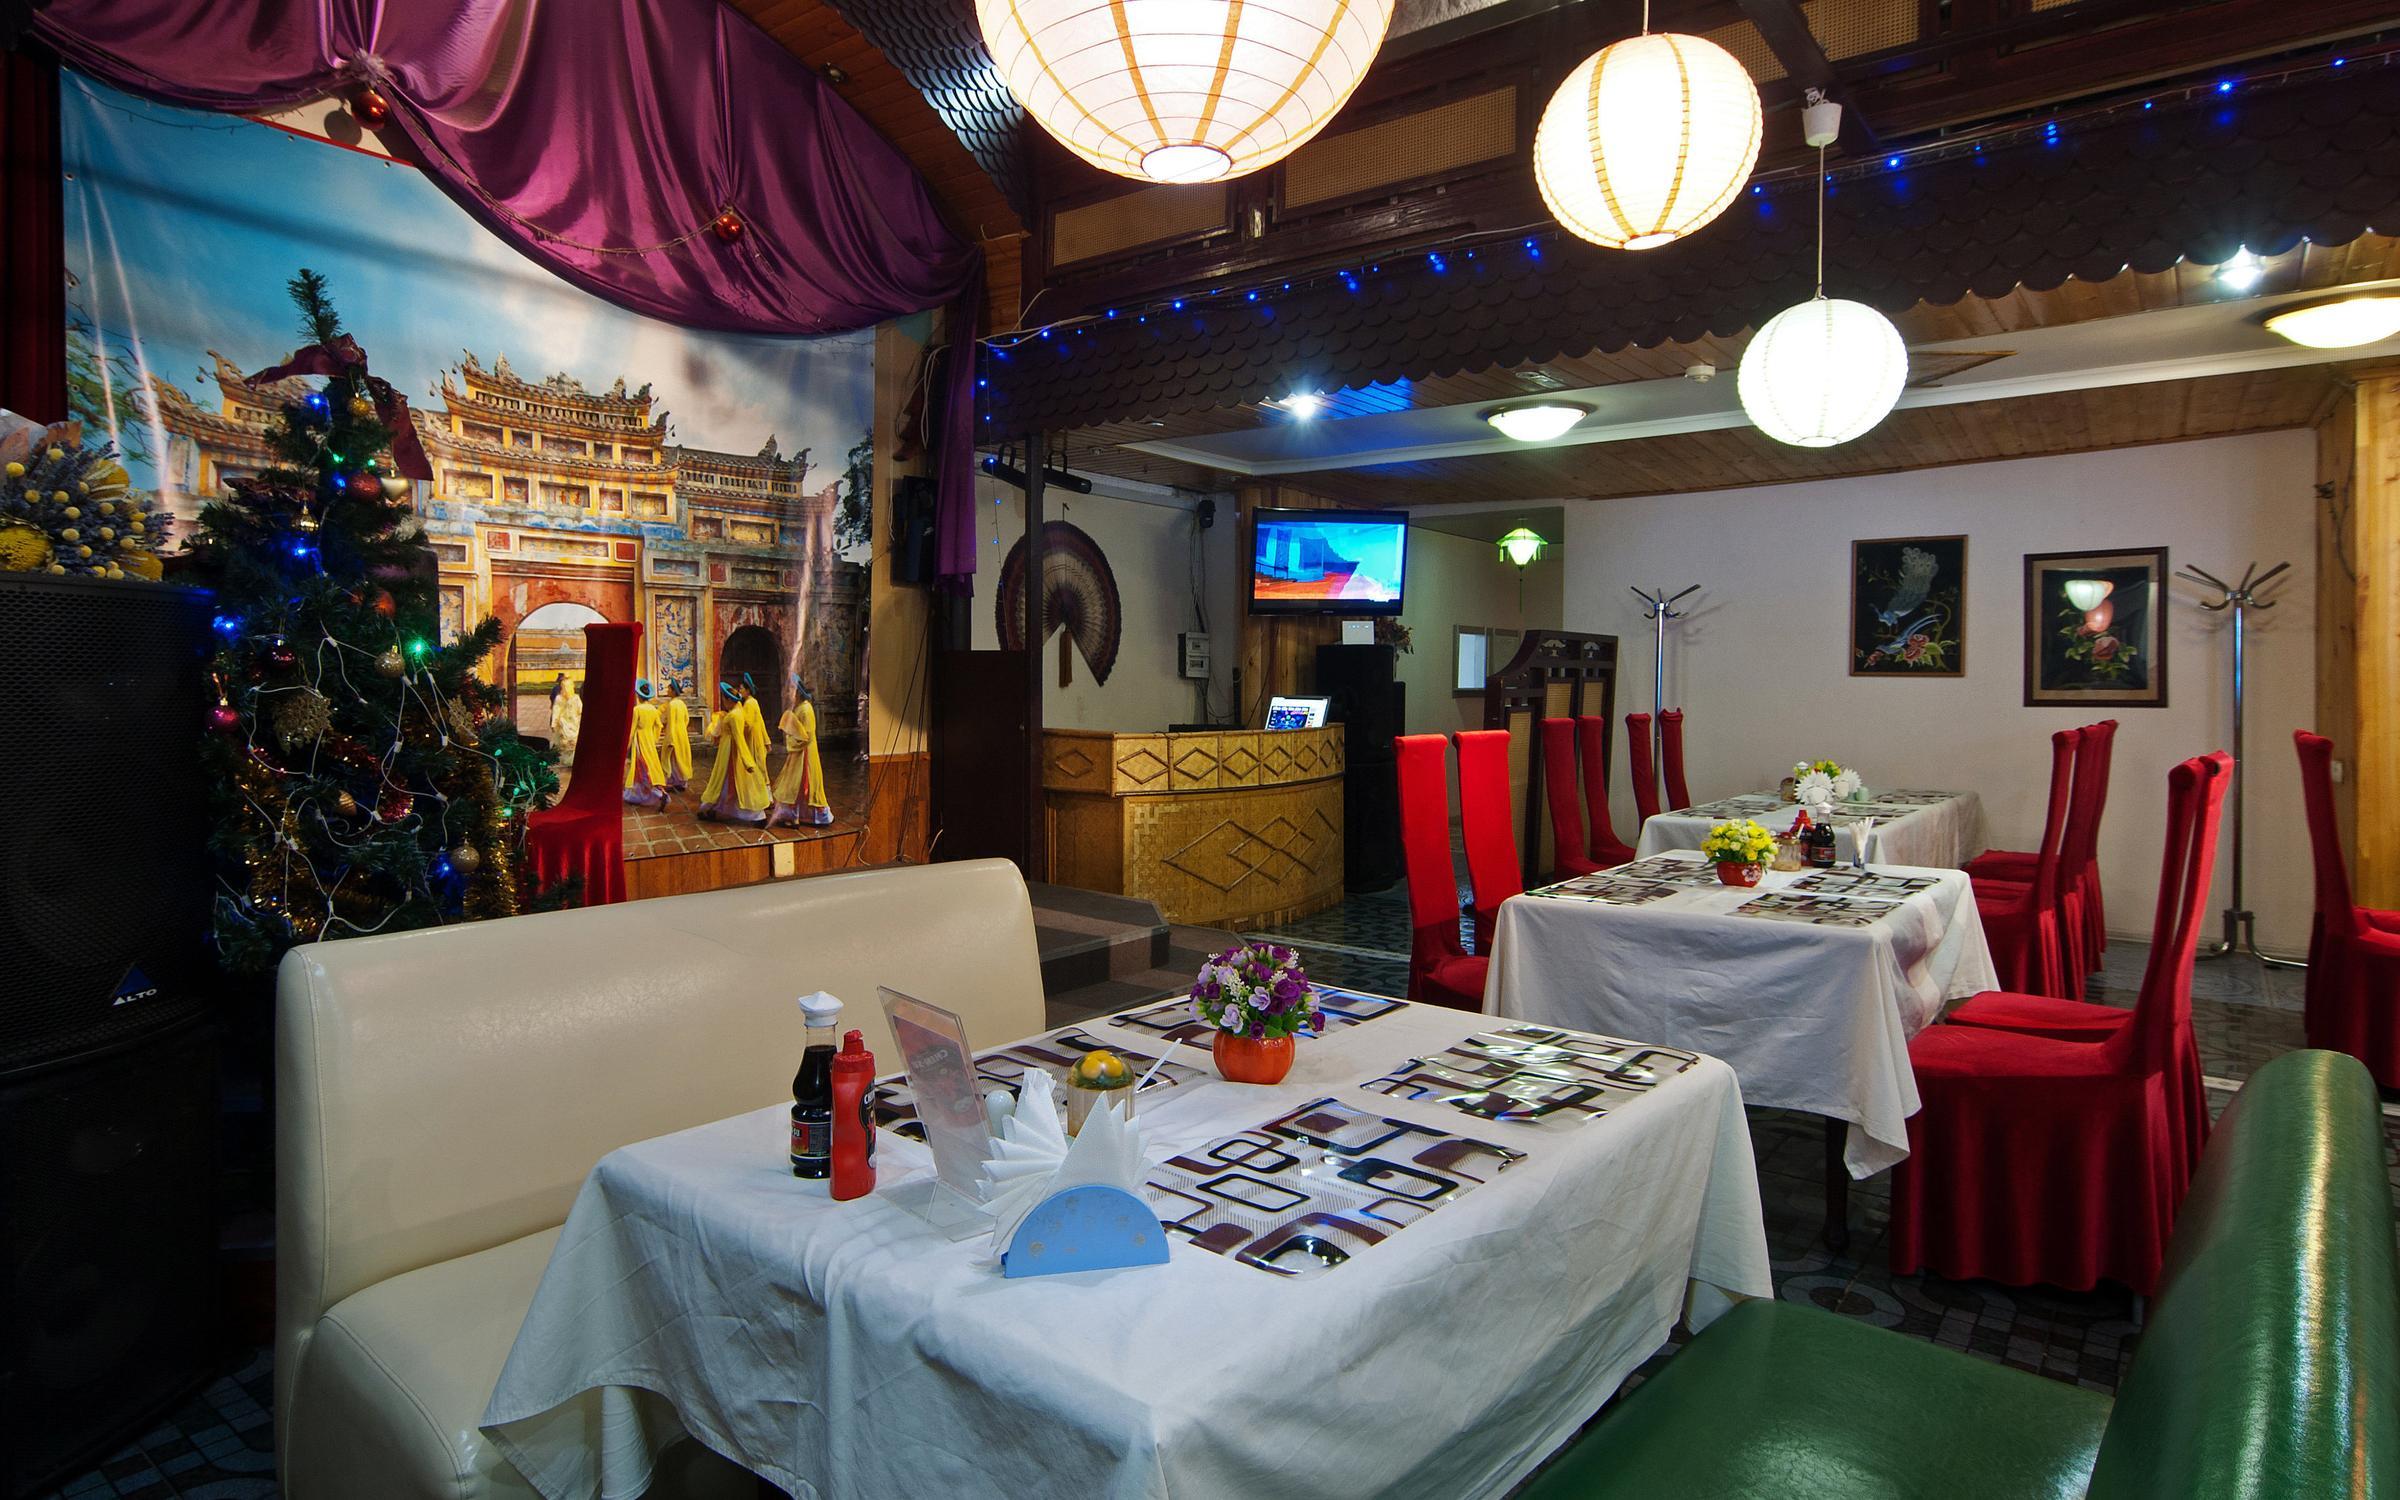 фотография Ресторана вьетнамской кухни Бик-Кау на улице Клары Цеткин